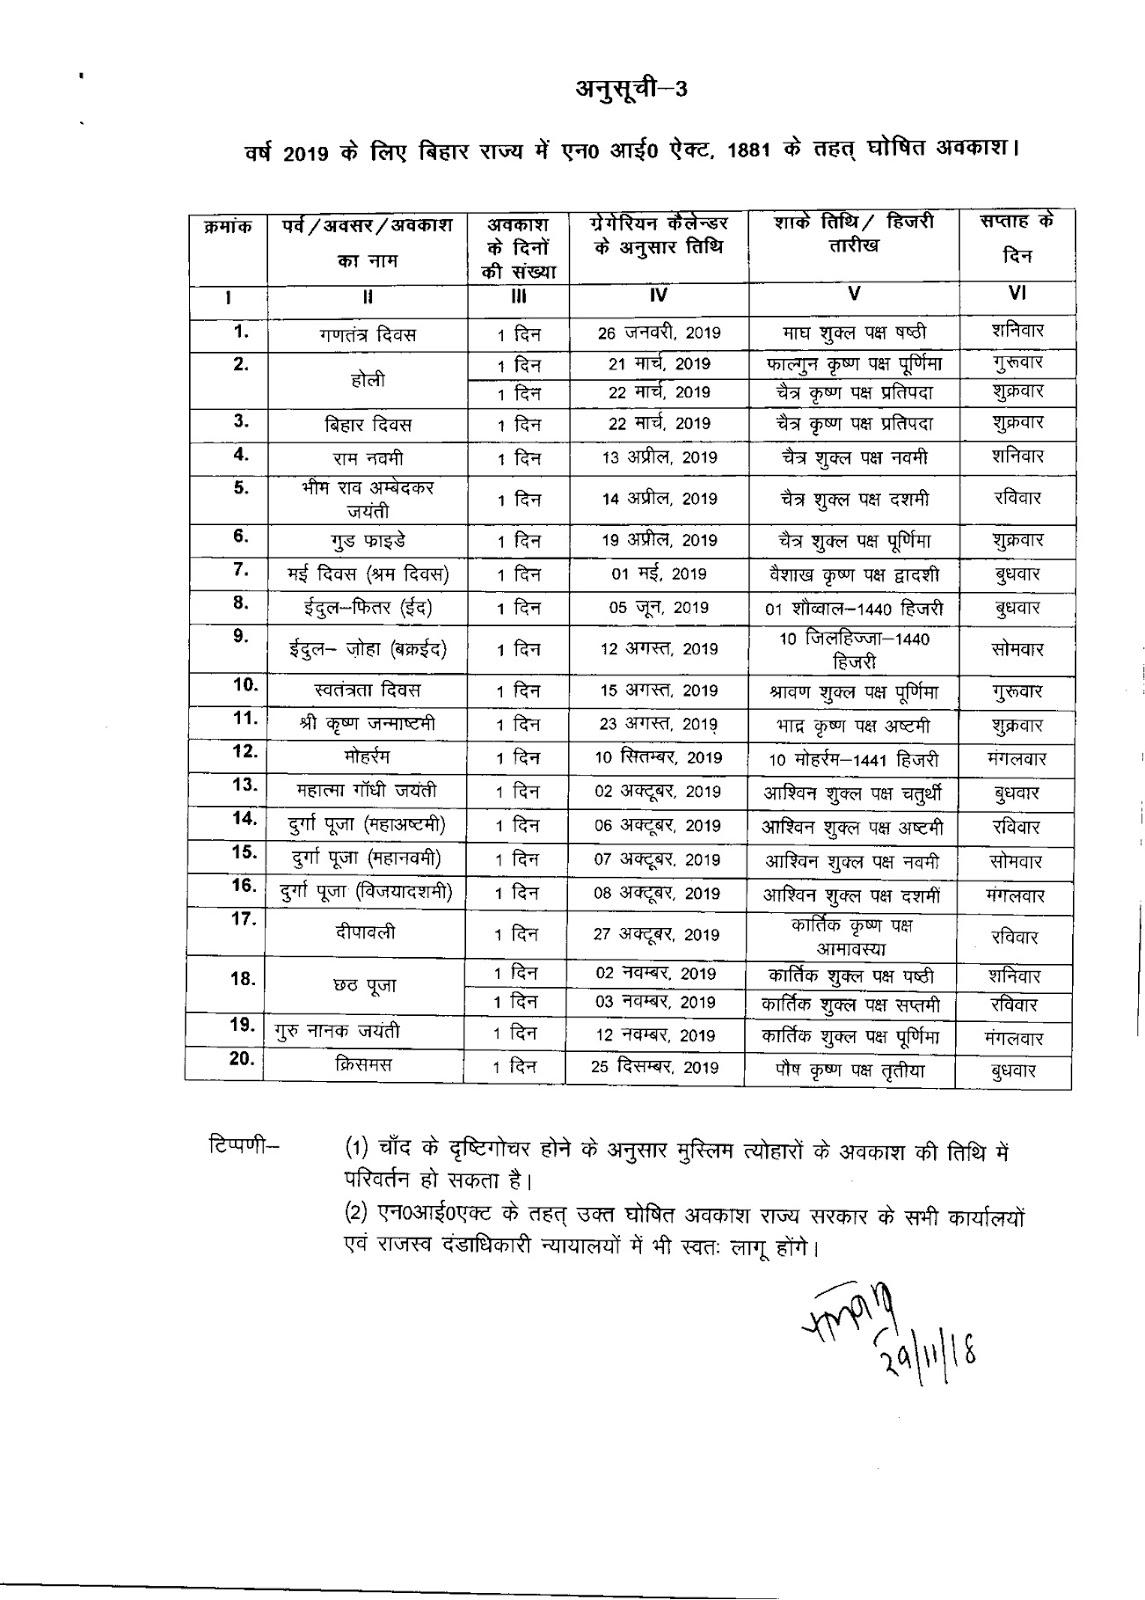 Bihar Government Calendar 2019 intended for Bihar Govt. Calendar